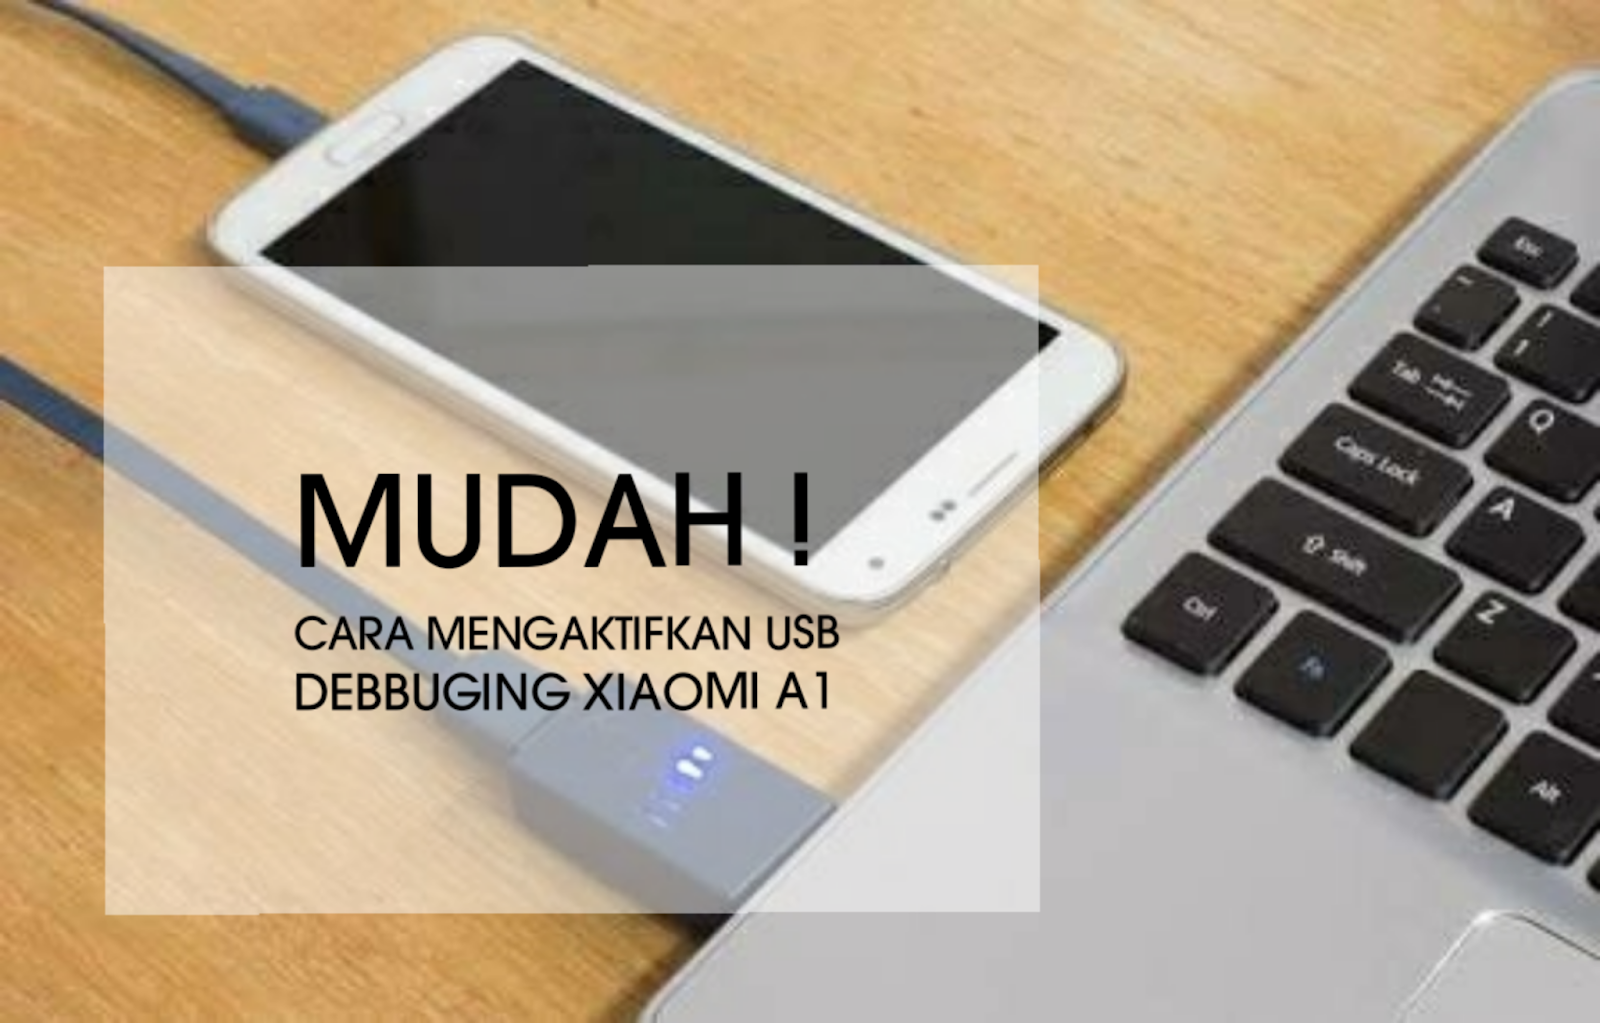 Cara mengaktifkan USB debbuging Xiaomi A1